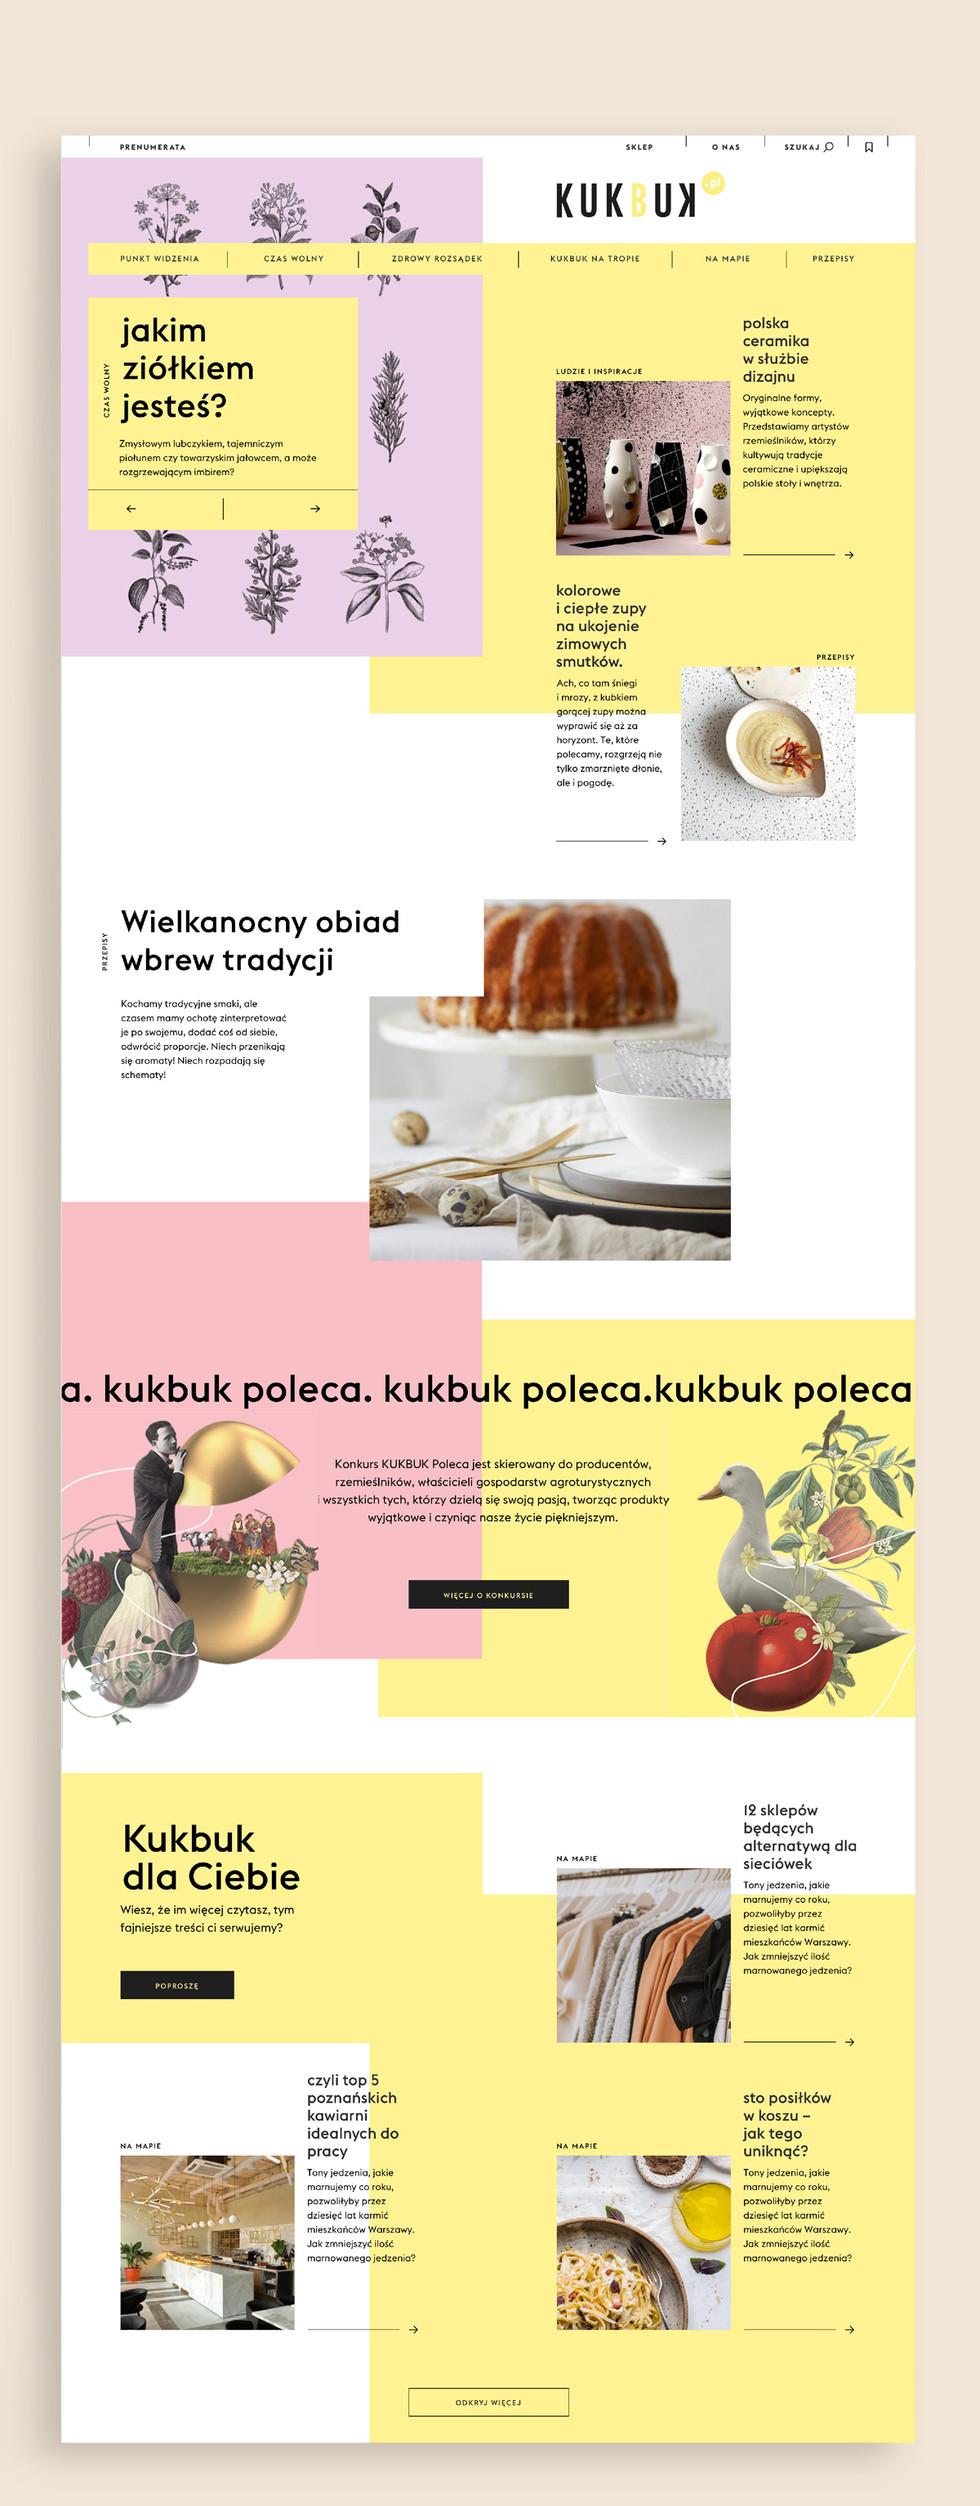 kukbuk_web13.jpg